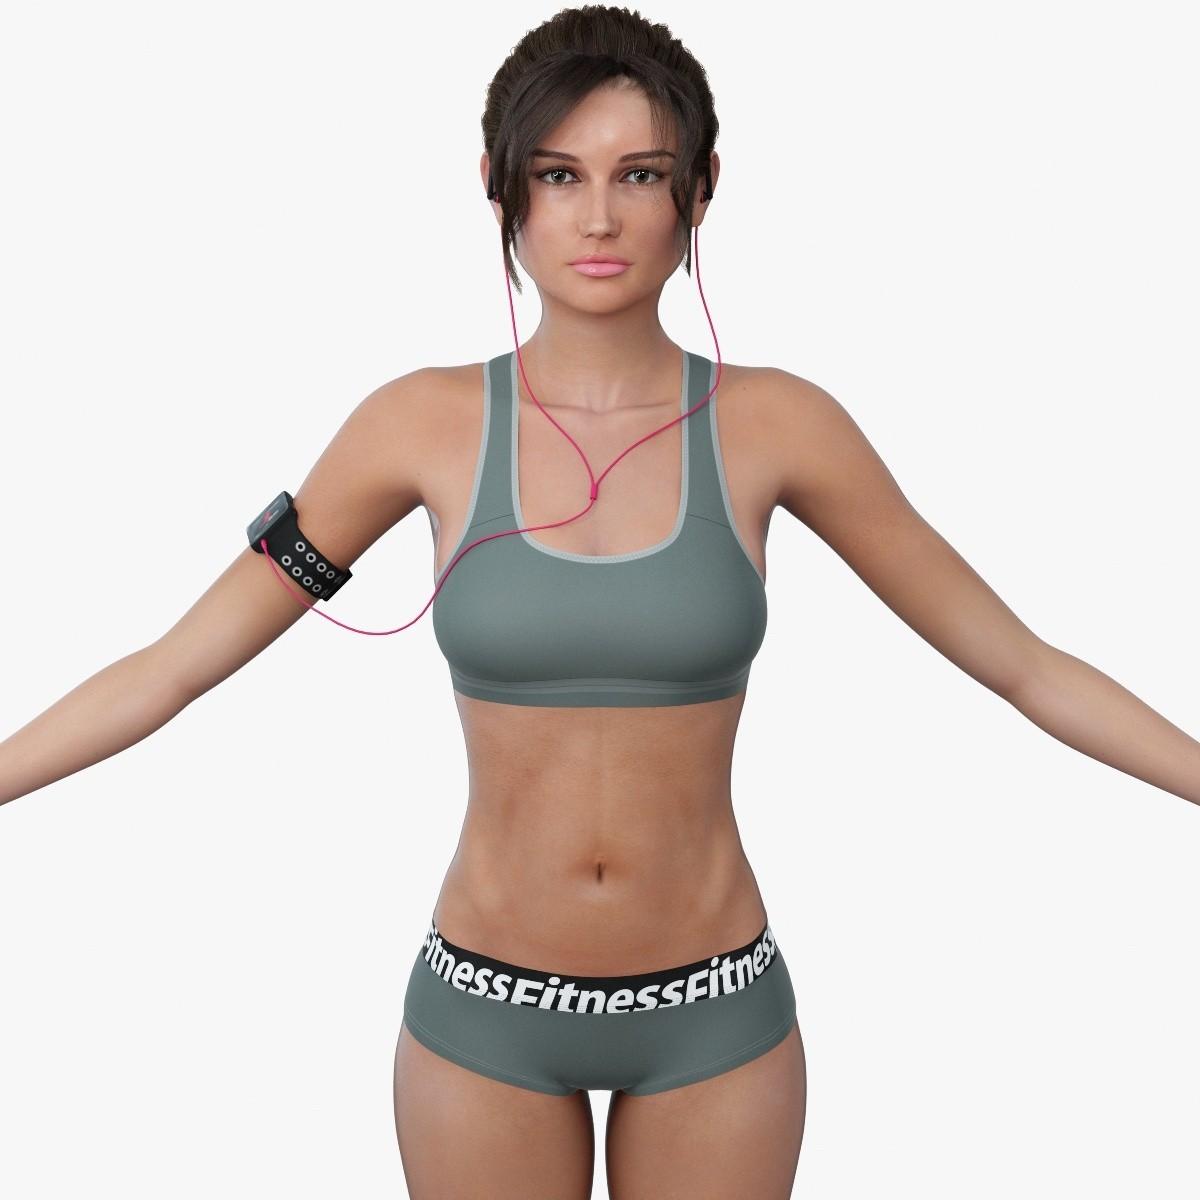 athlete_female_0000.jpg